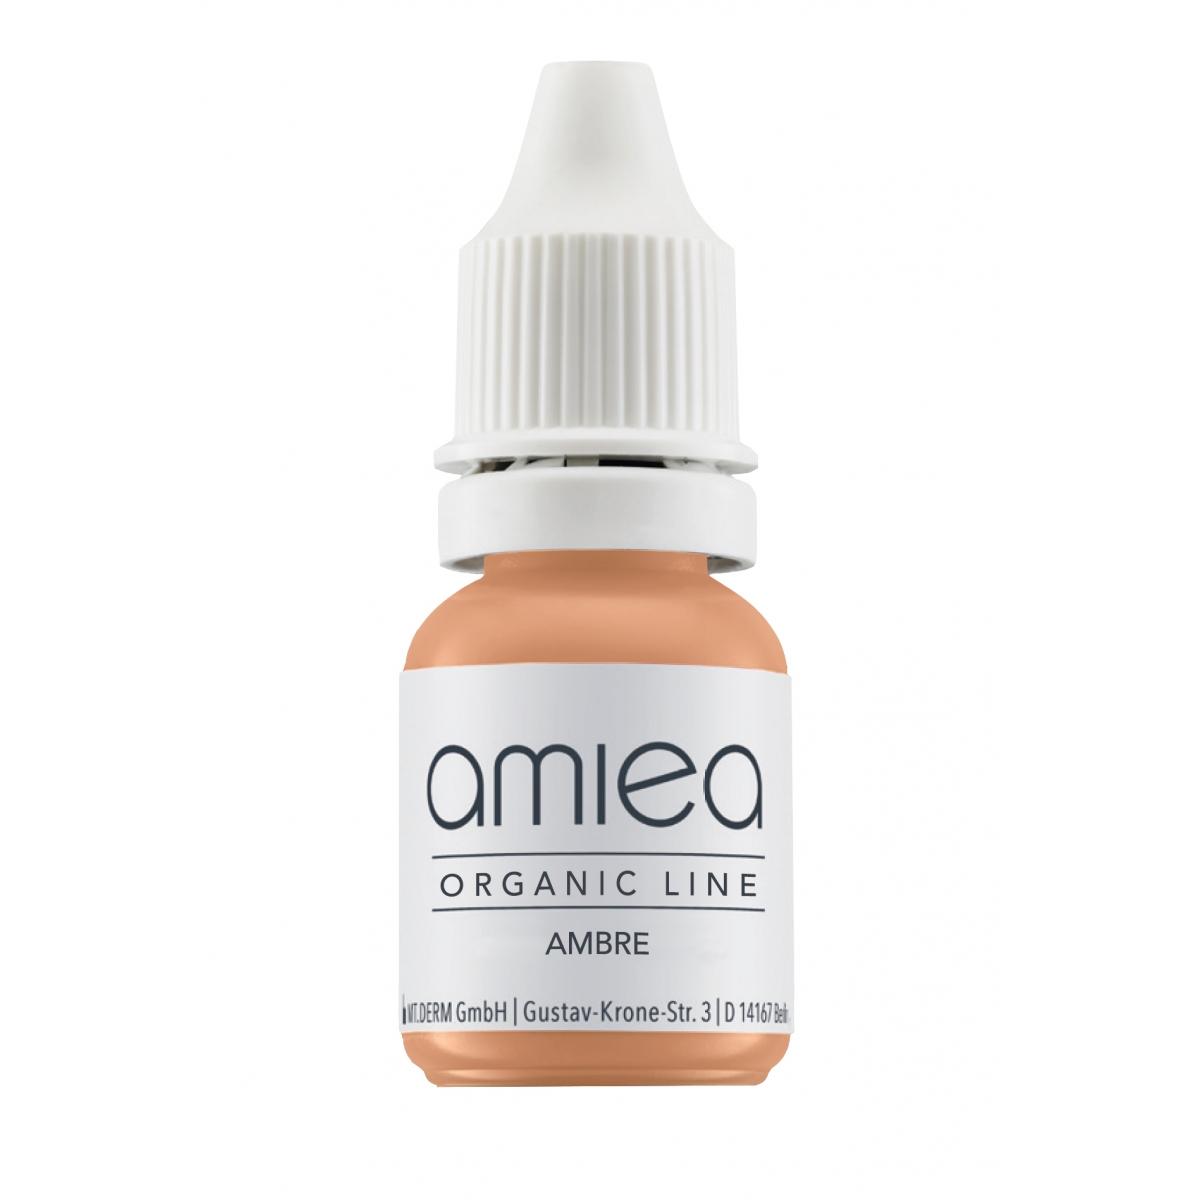 Organicline (5 ml)  - PIGMENTS AMIEA ORGANICLINE CORRECTEUR AMBRE, Flacon 5 ml